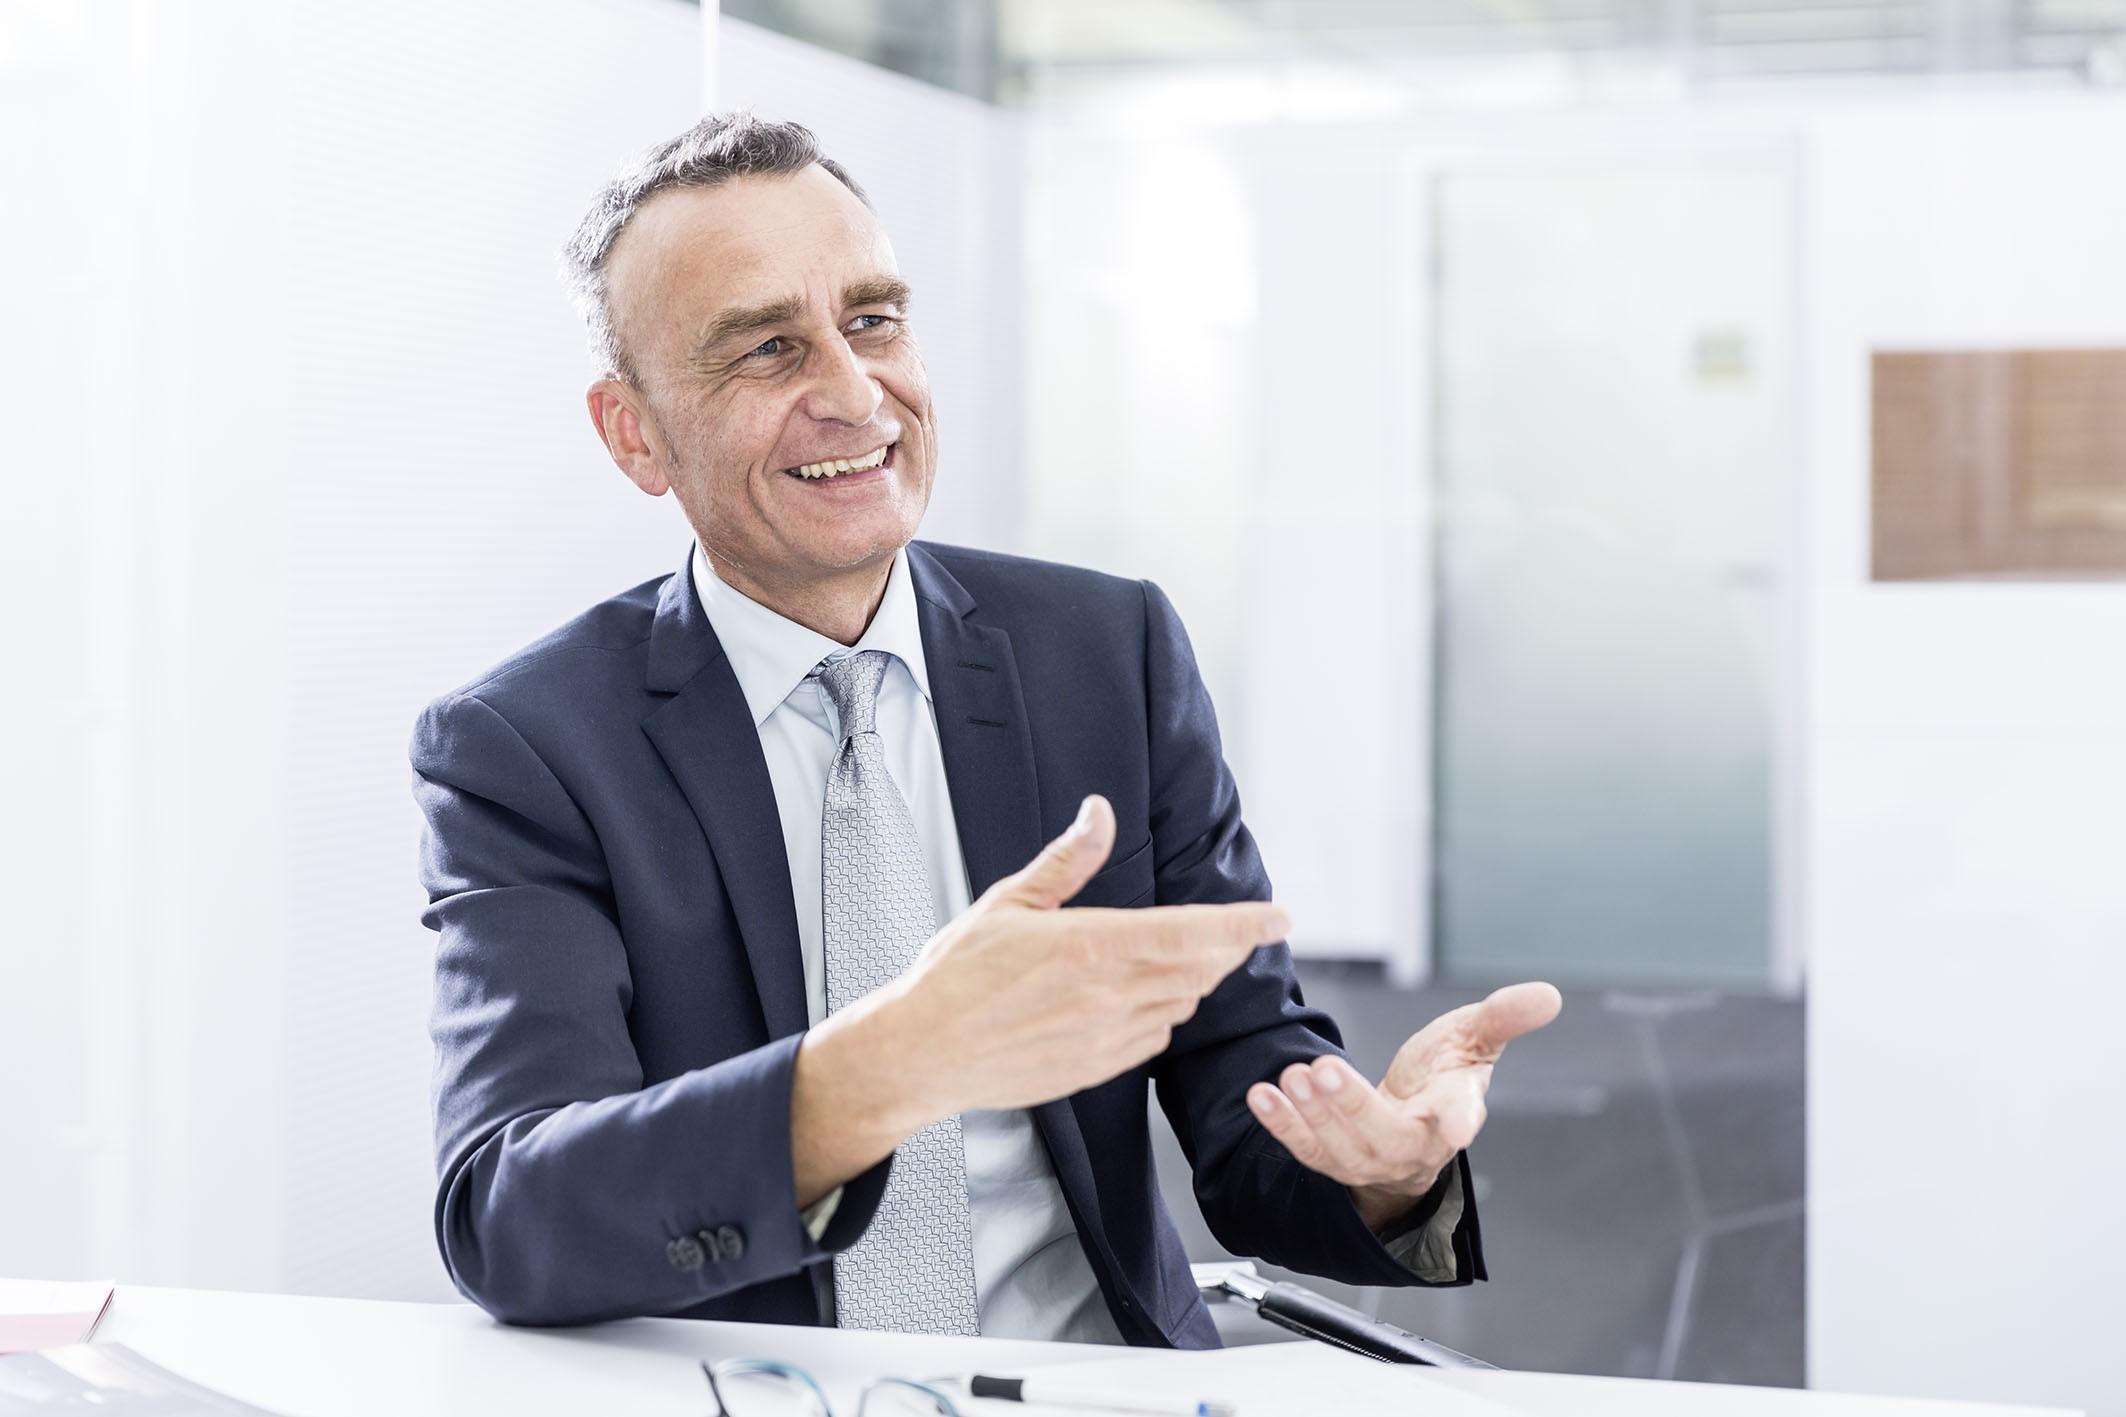 Andreas Rieser, Geschäftsführer ATP Nürnberg.<br><span class='image_copyright'>ATP/Rauschmeir</span><br>